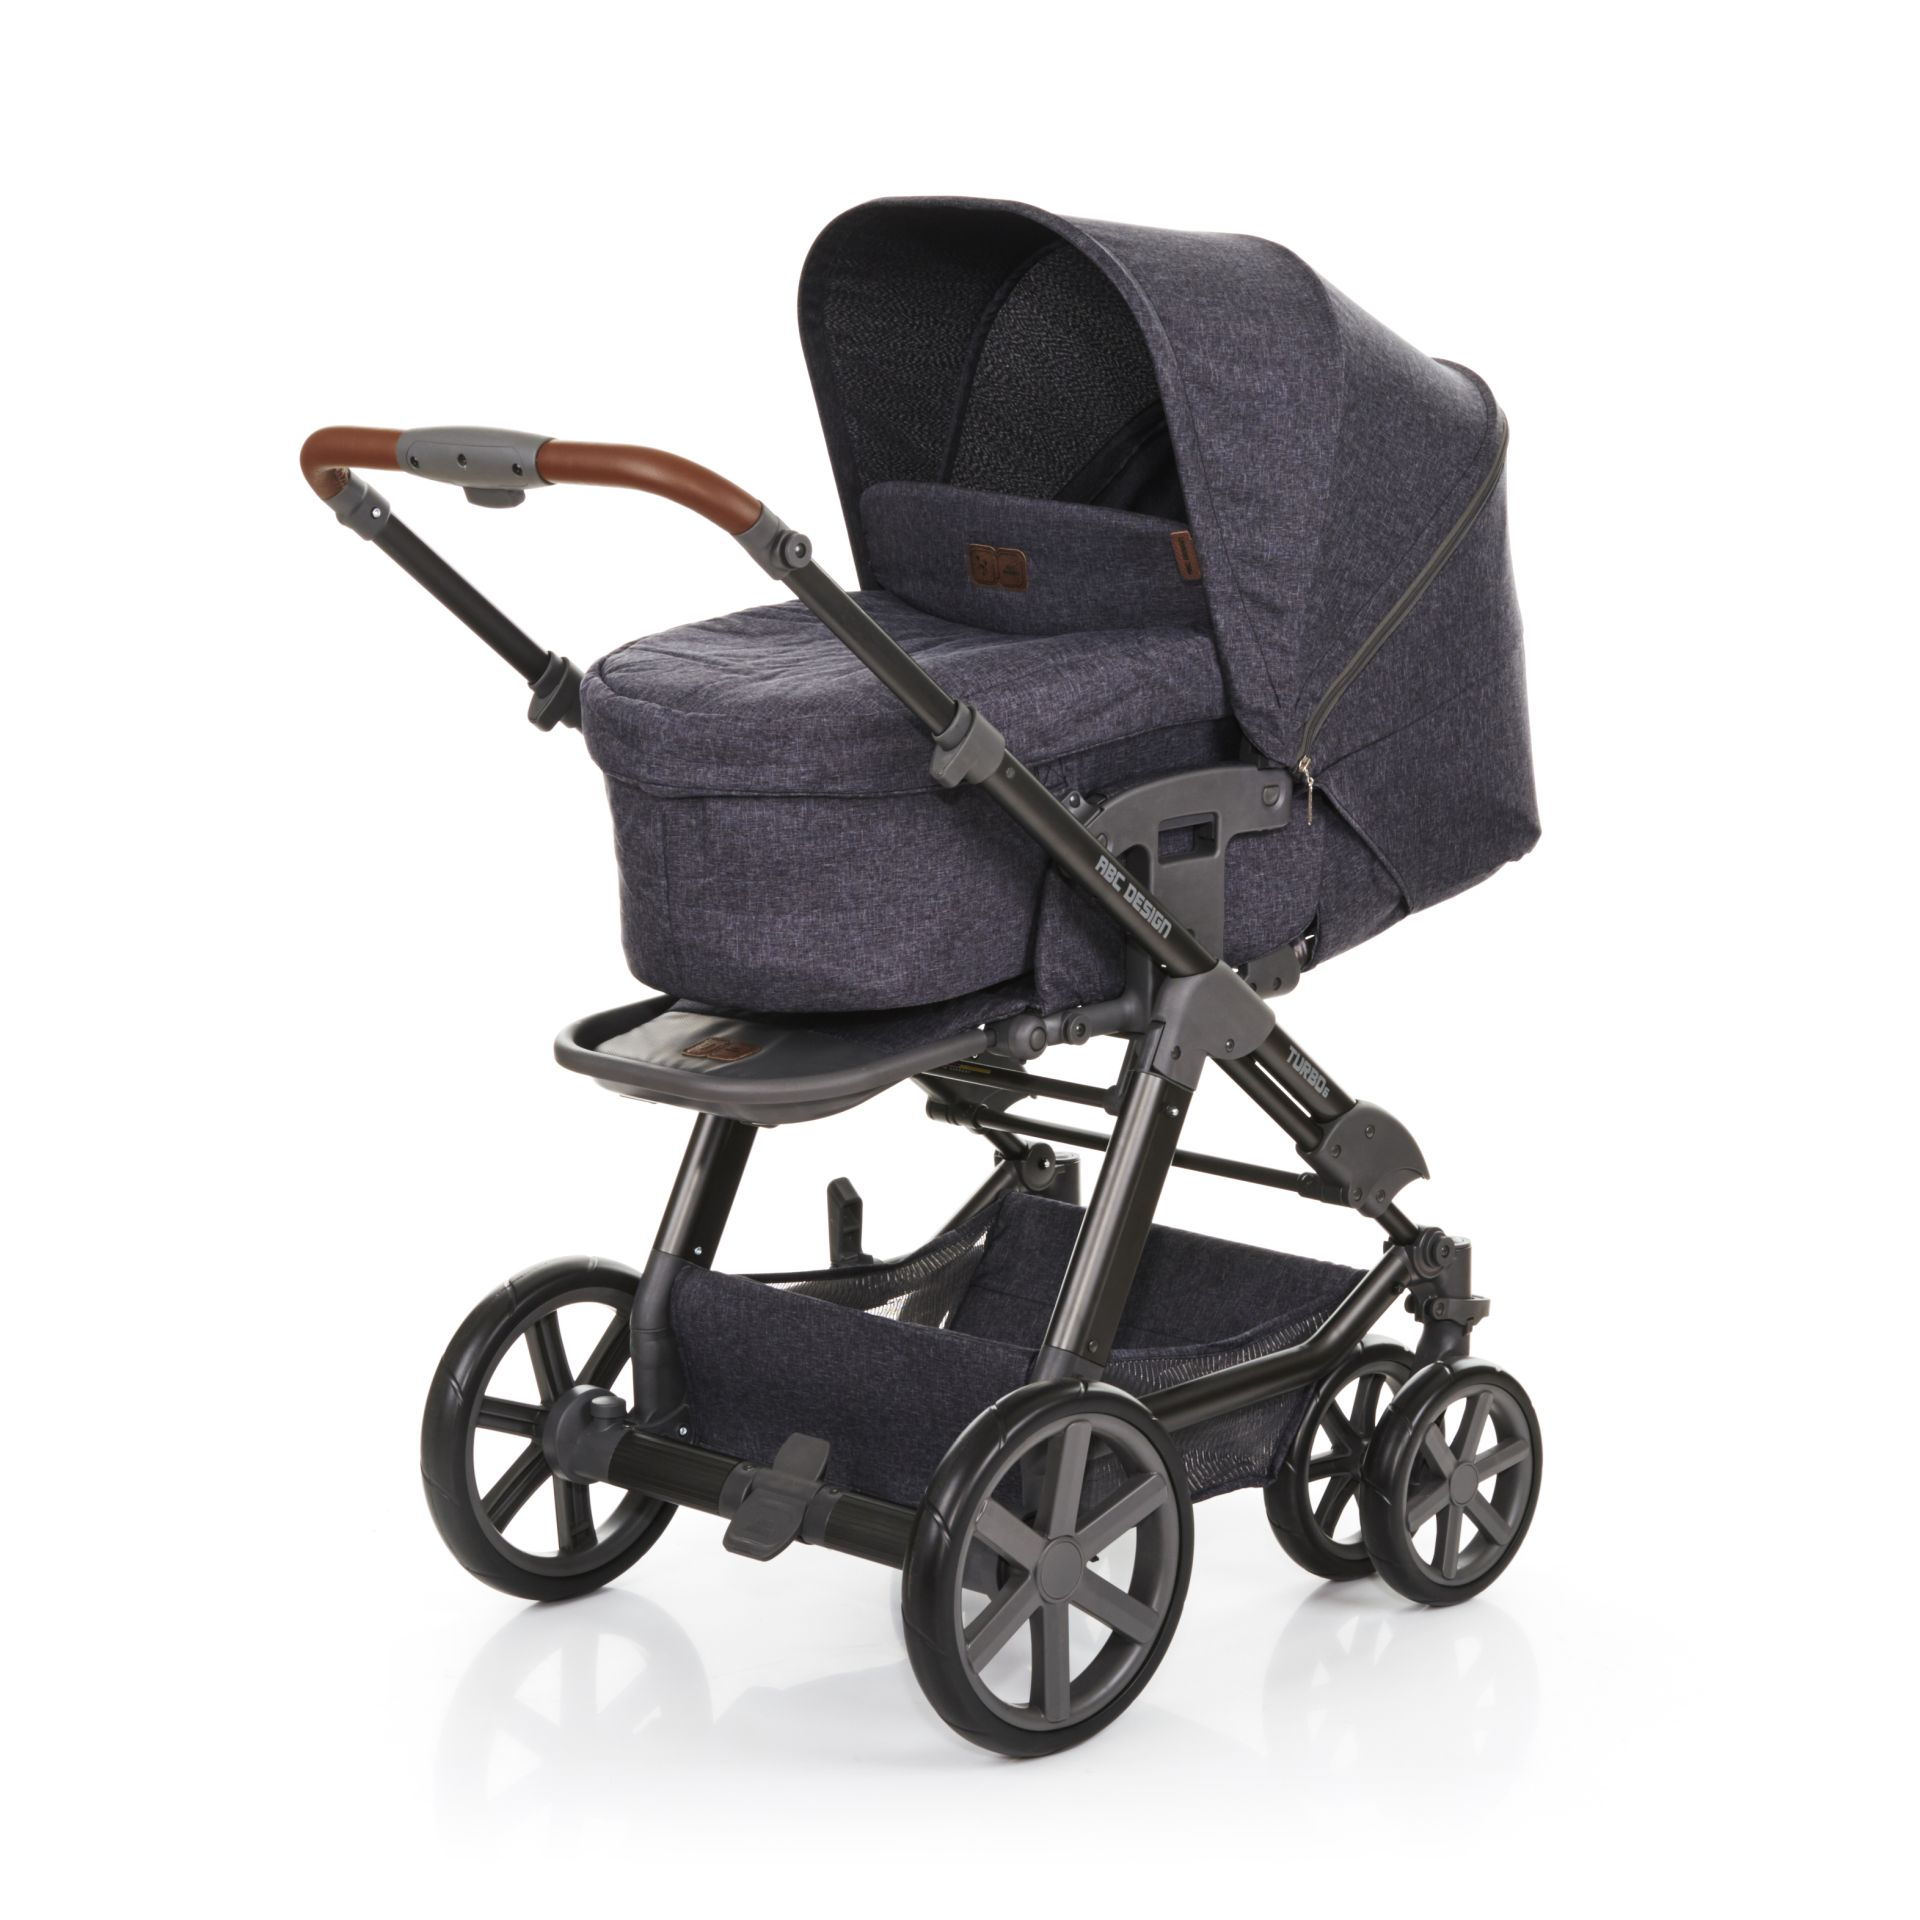 ABC-Design stroller Turbo 6 2018 street - Buy at kidsroom ...